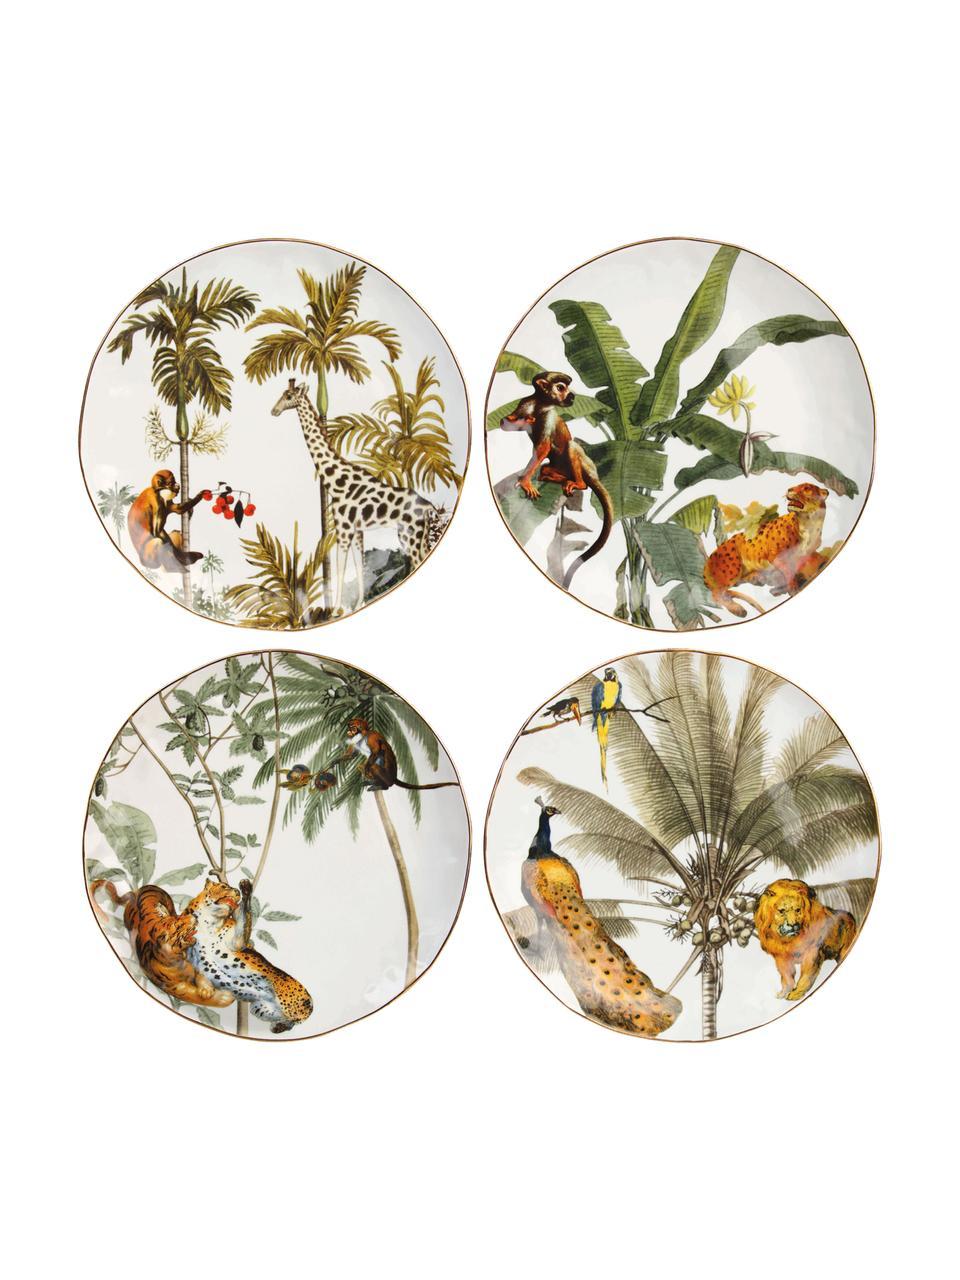 Ontbijtbord Animaux met goudkleurige rand en tropische motieven, 4-delig, Porselein, Multicolour, Ø 20 cm